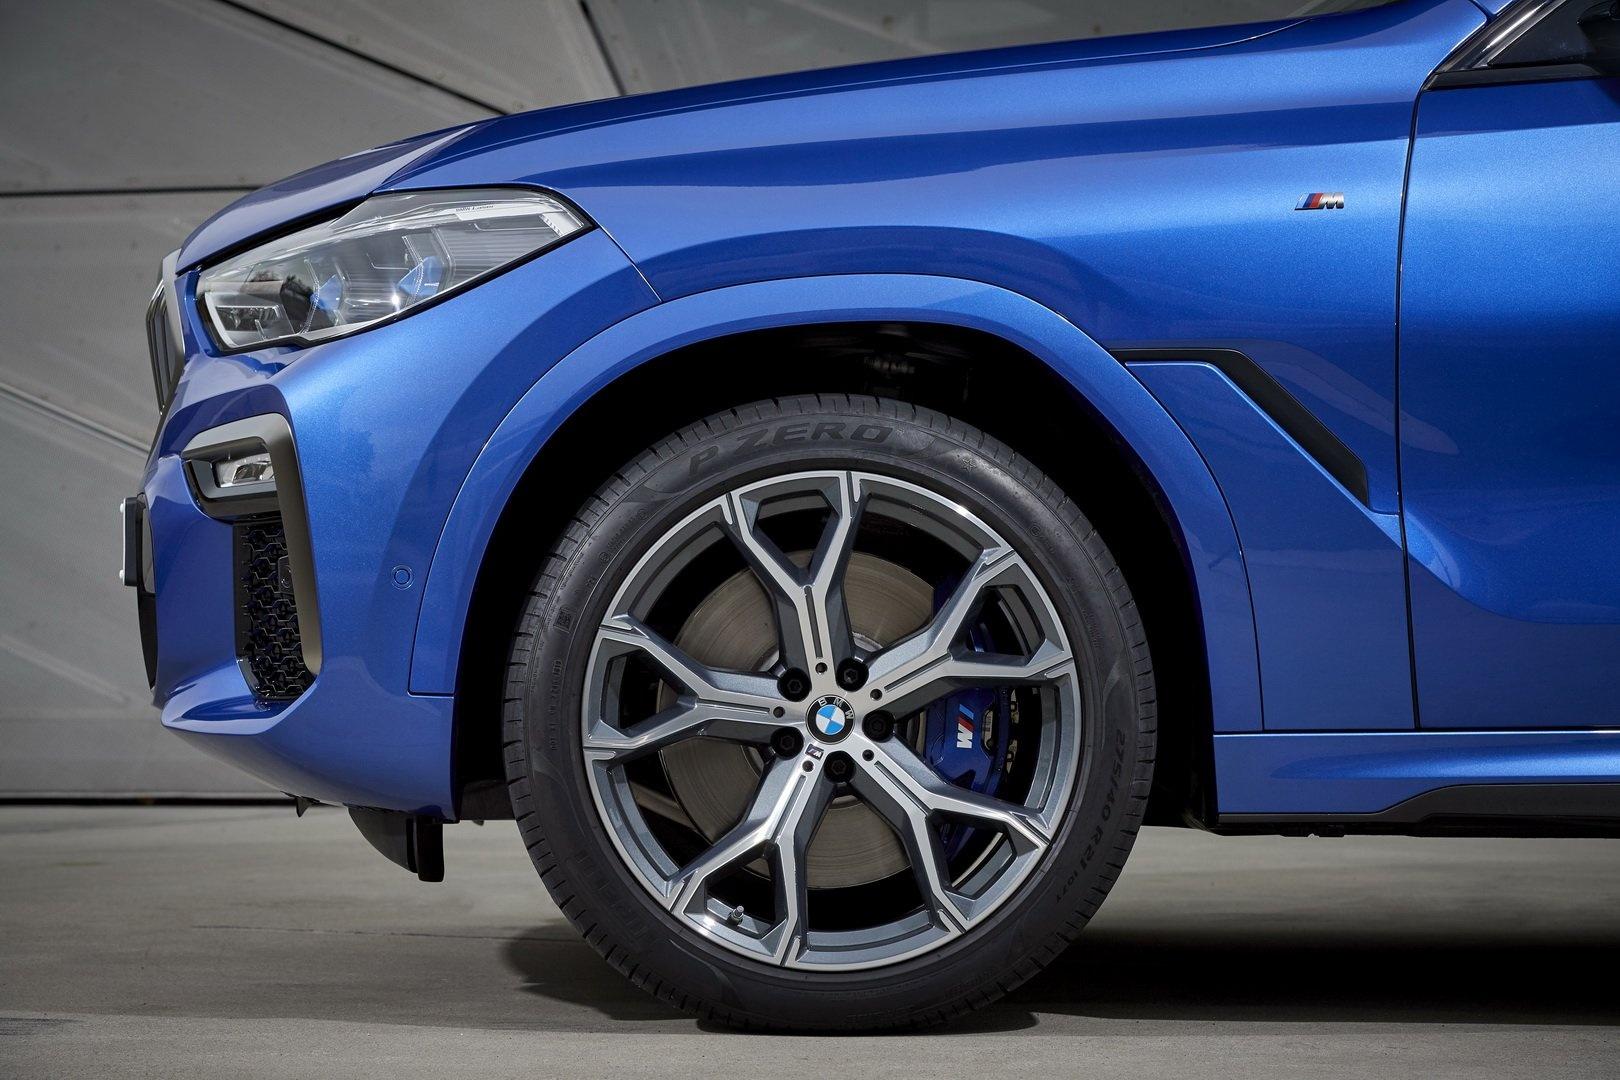 BMW X6 2020 - SUV voi suc manh sieu xe hinh anh 20